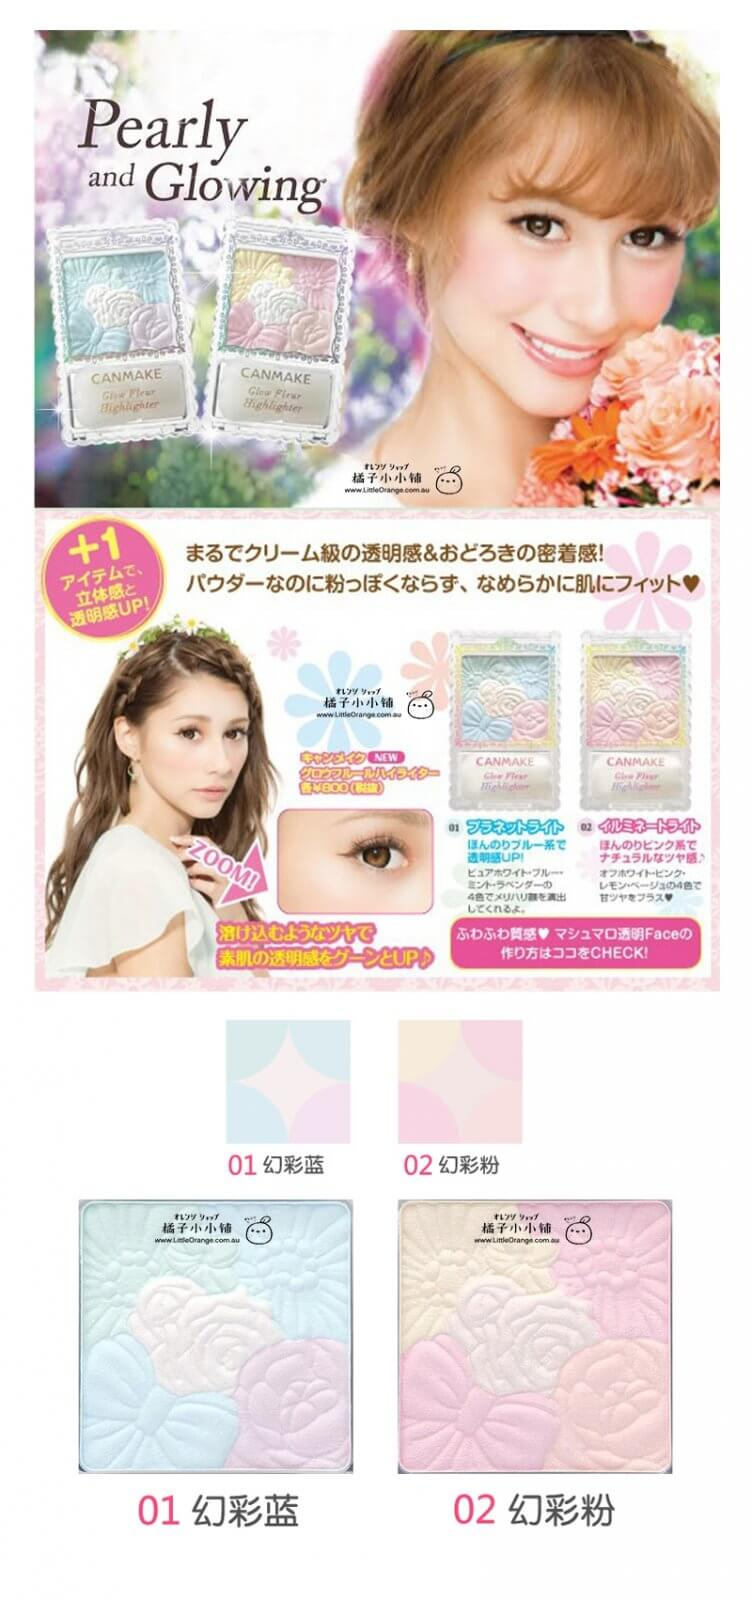 Canmake Glow Fleur Highlighter-1